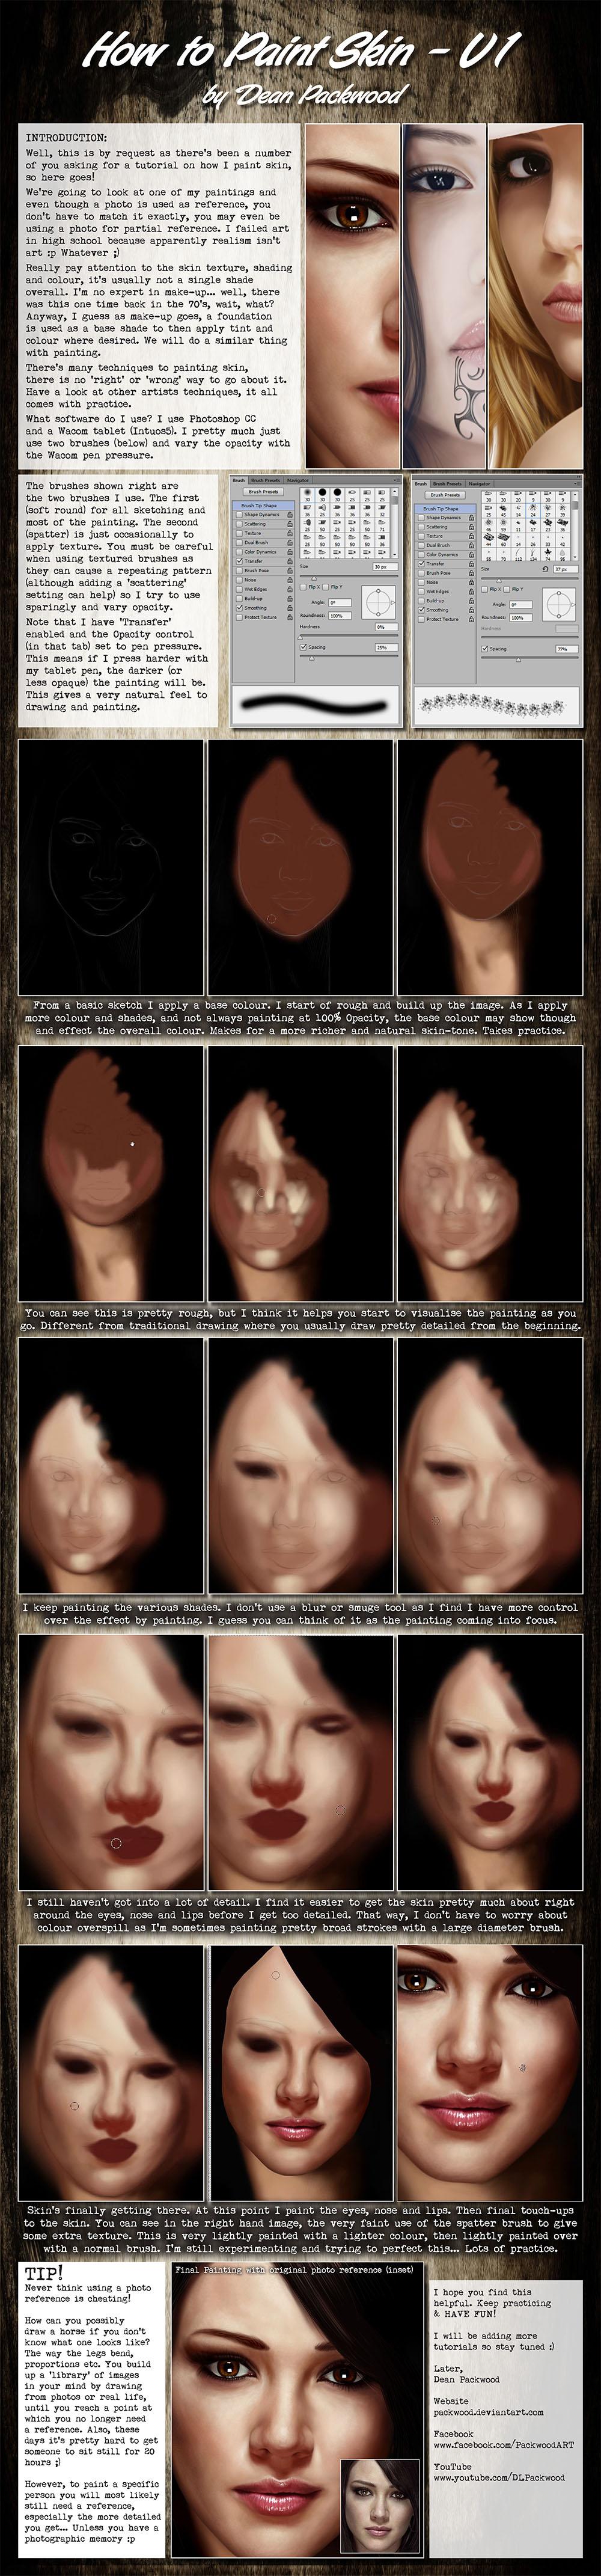 Skin Tutorial - V1 by Packwood